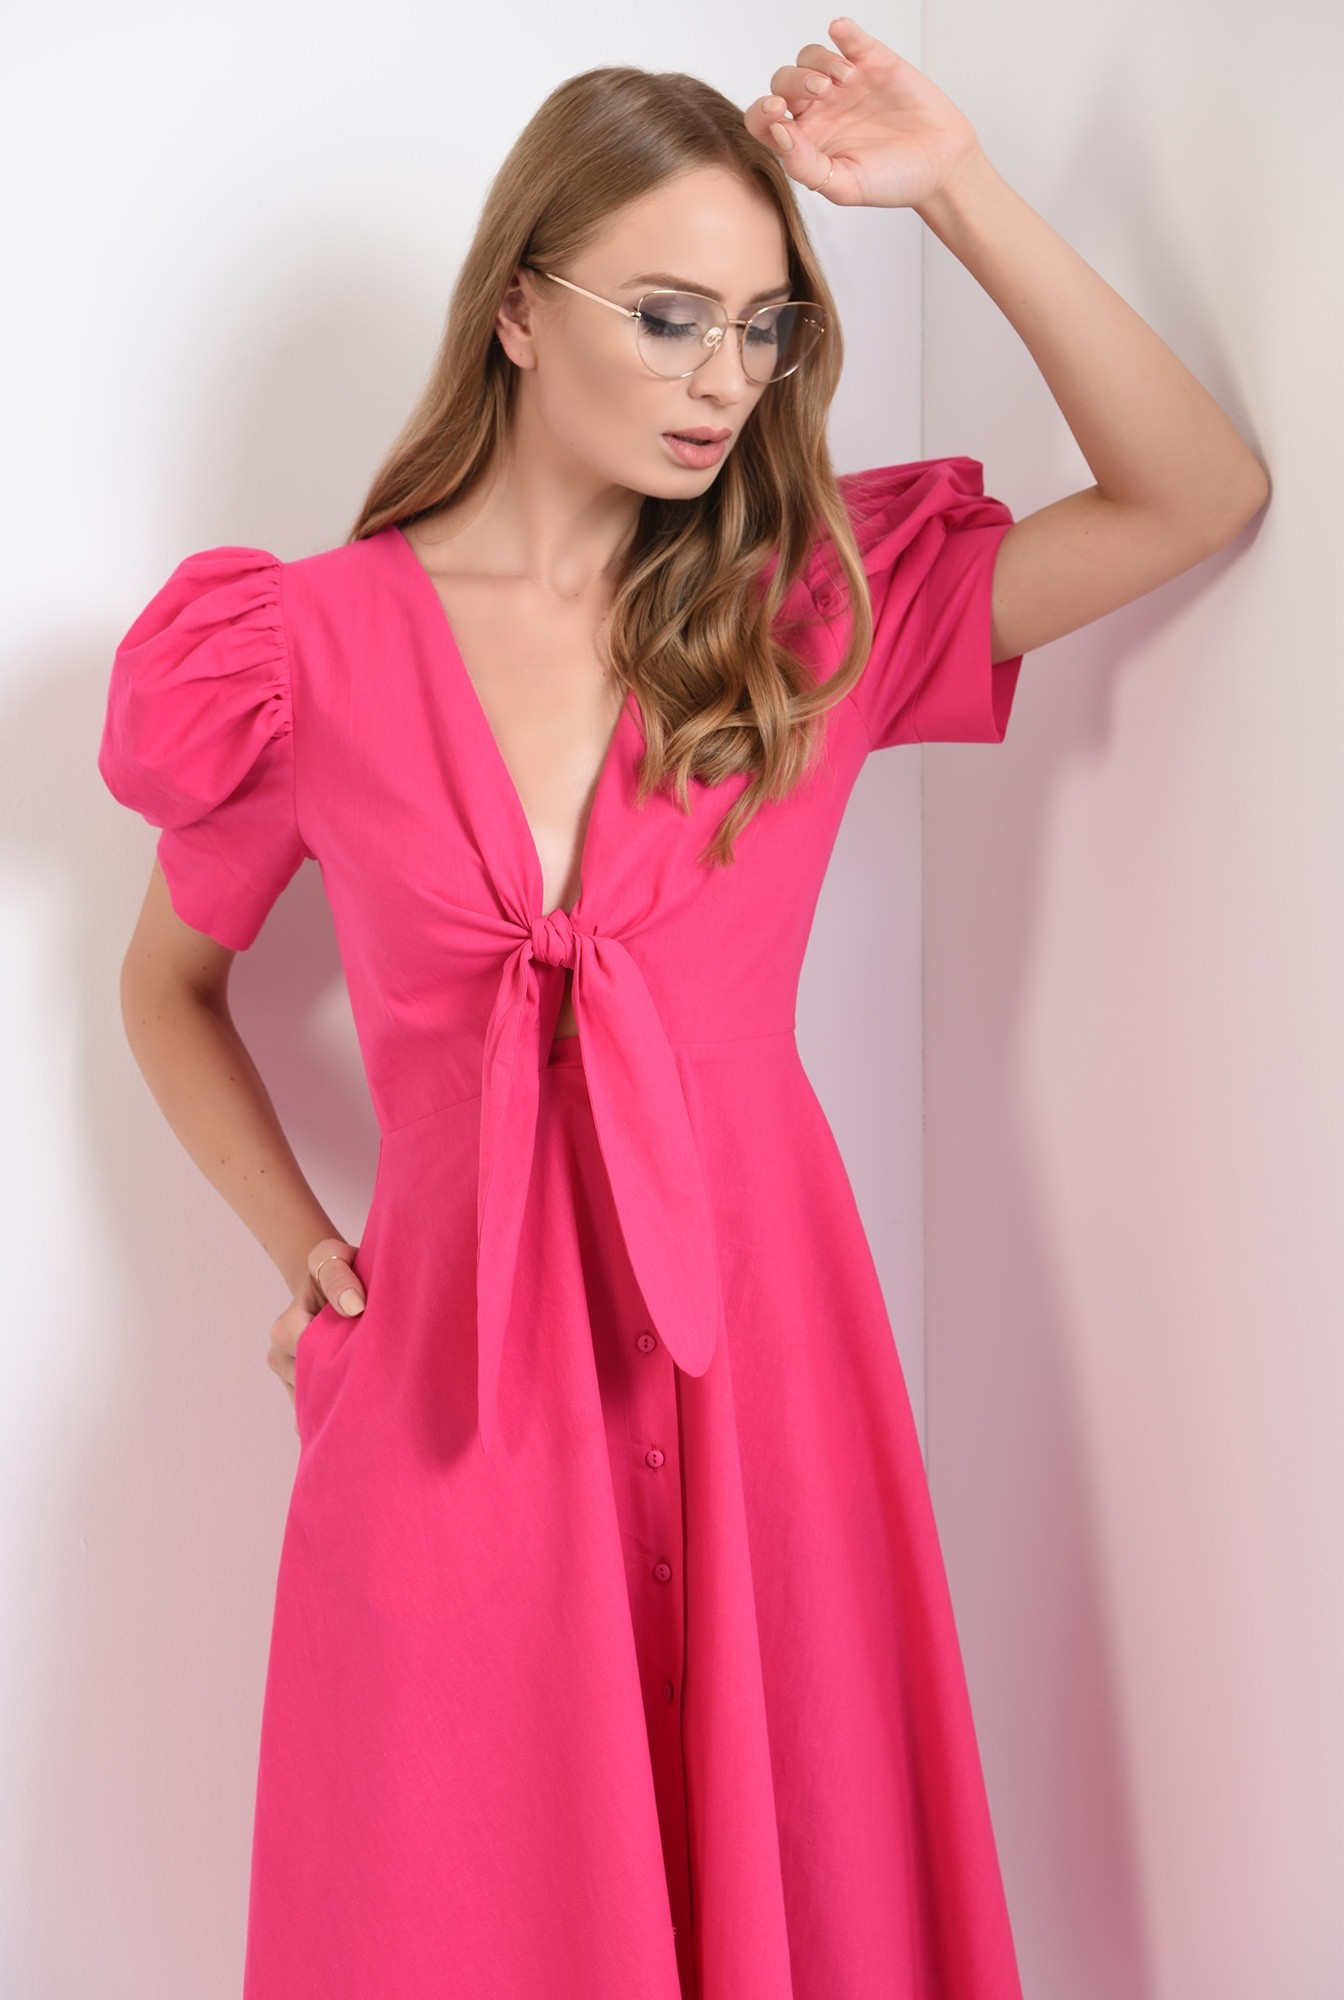 0 - 360 - rochie casual, din poplin, cu nod, decolteu, funda